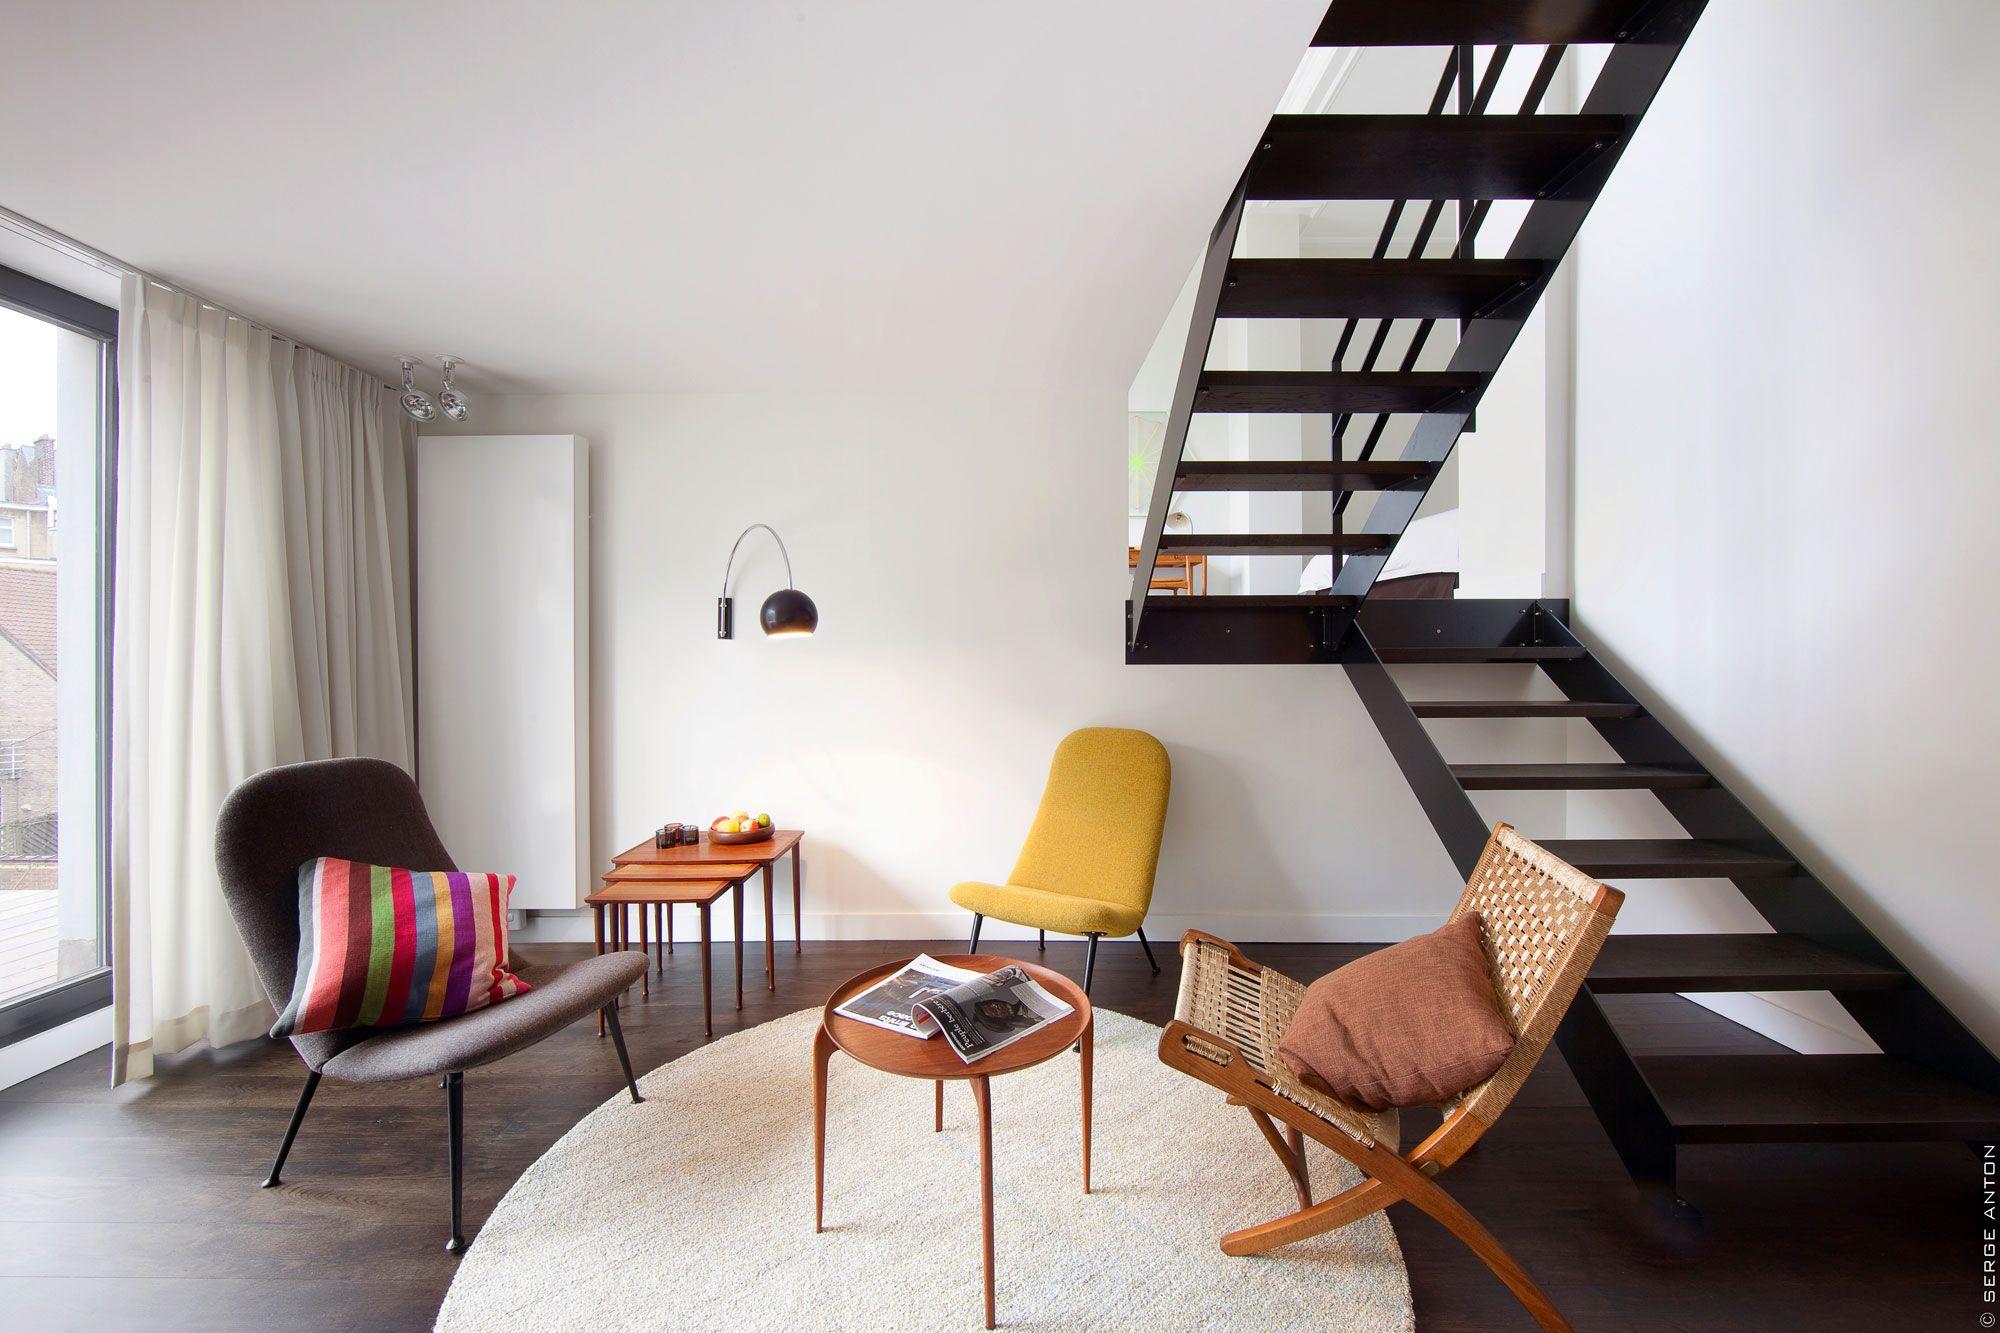 Tenbosh House by Patrice Lemeret and Michel Penneman